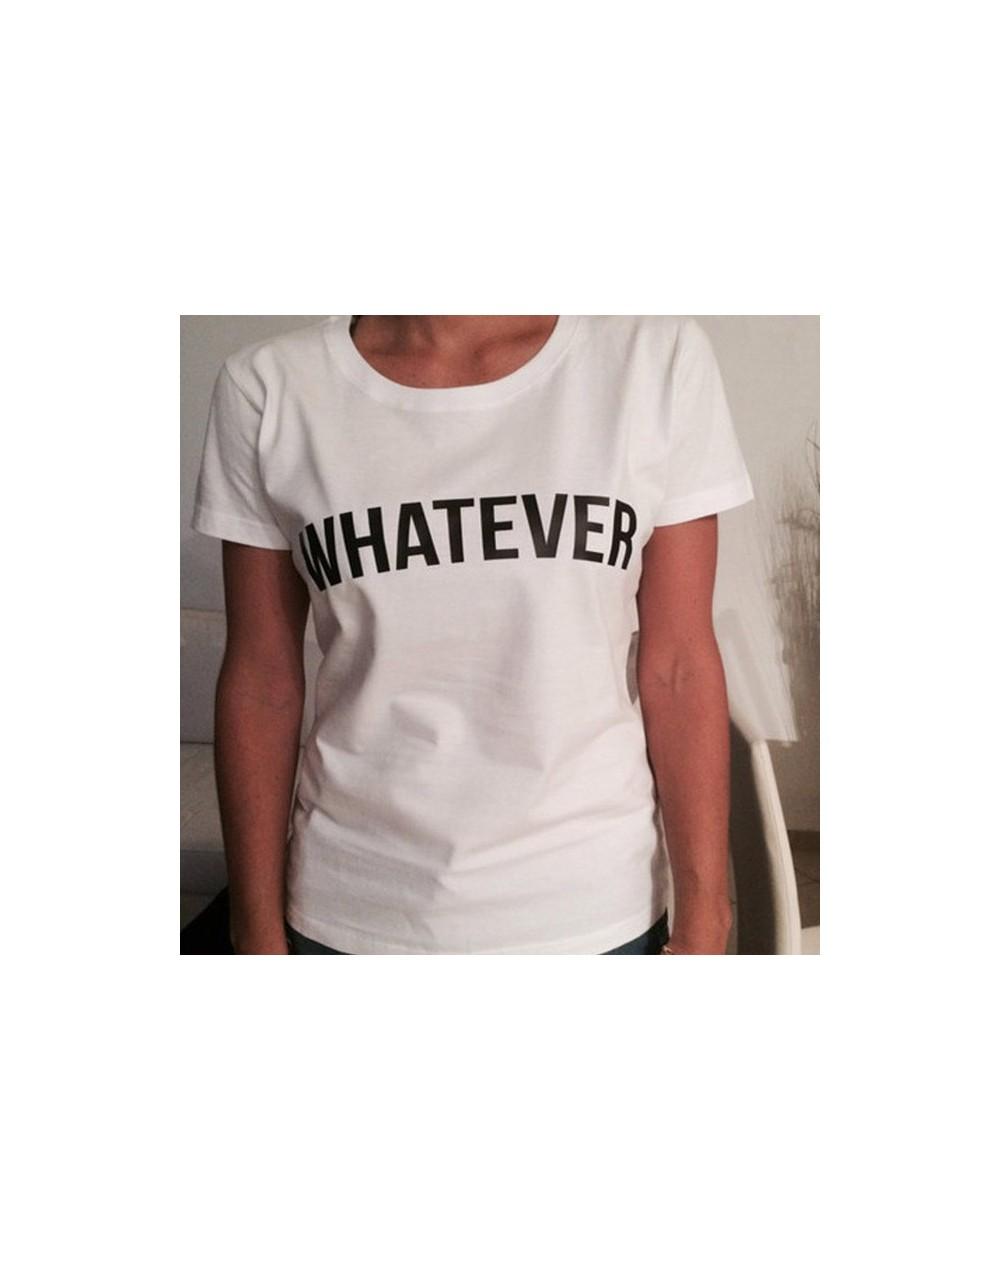 Summer Tops 2016 Casual Tshirt Women T Shirt Letter Print I Forgive You Short Sleeve White And Black Tees T-shirt Female - 3...